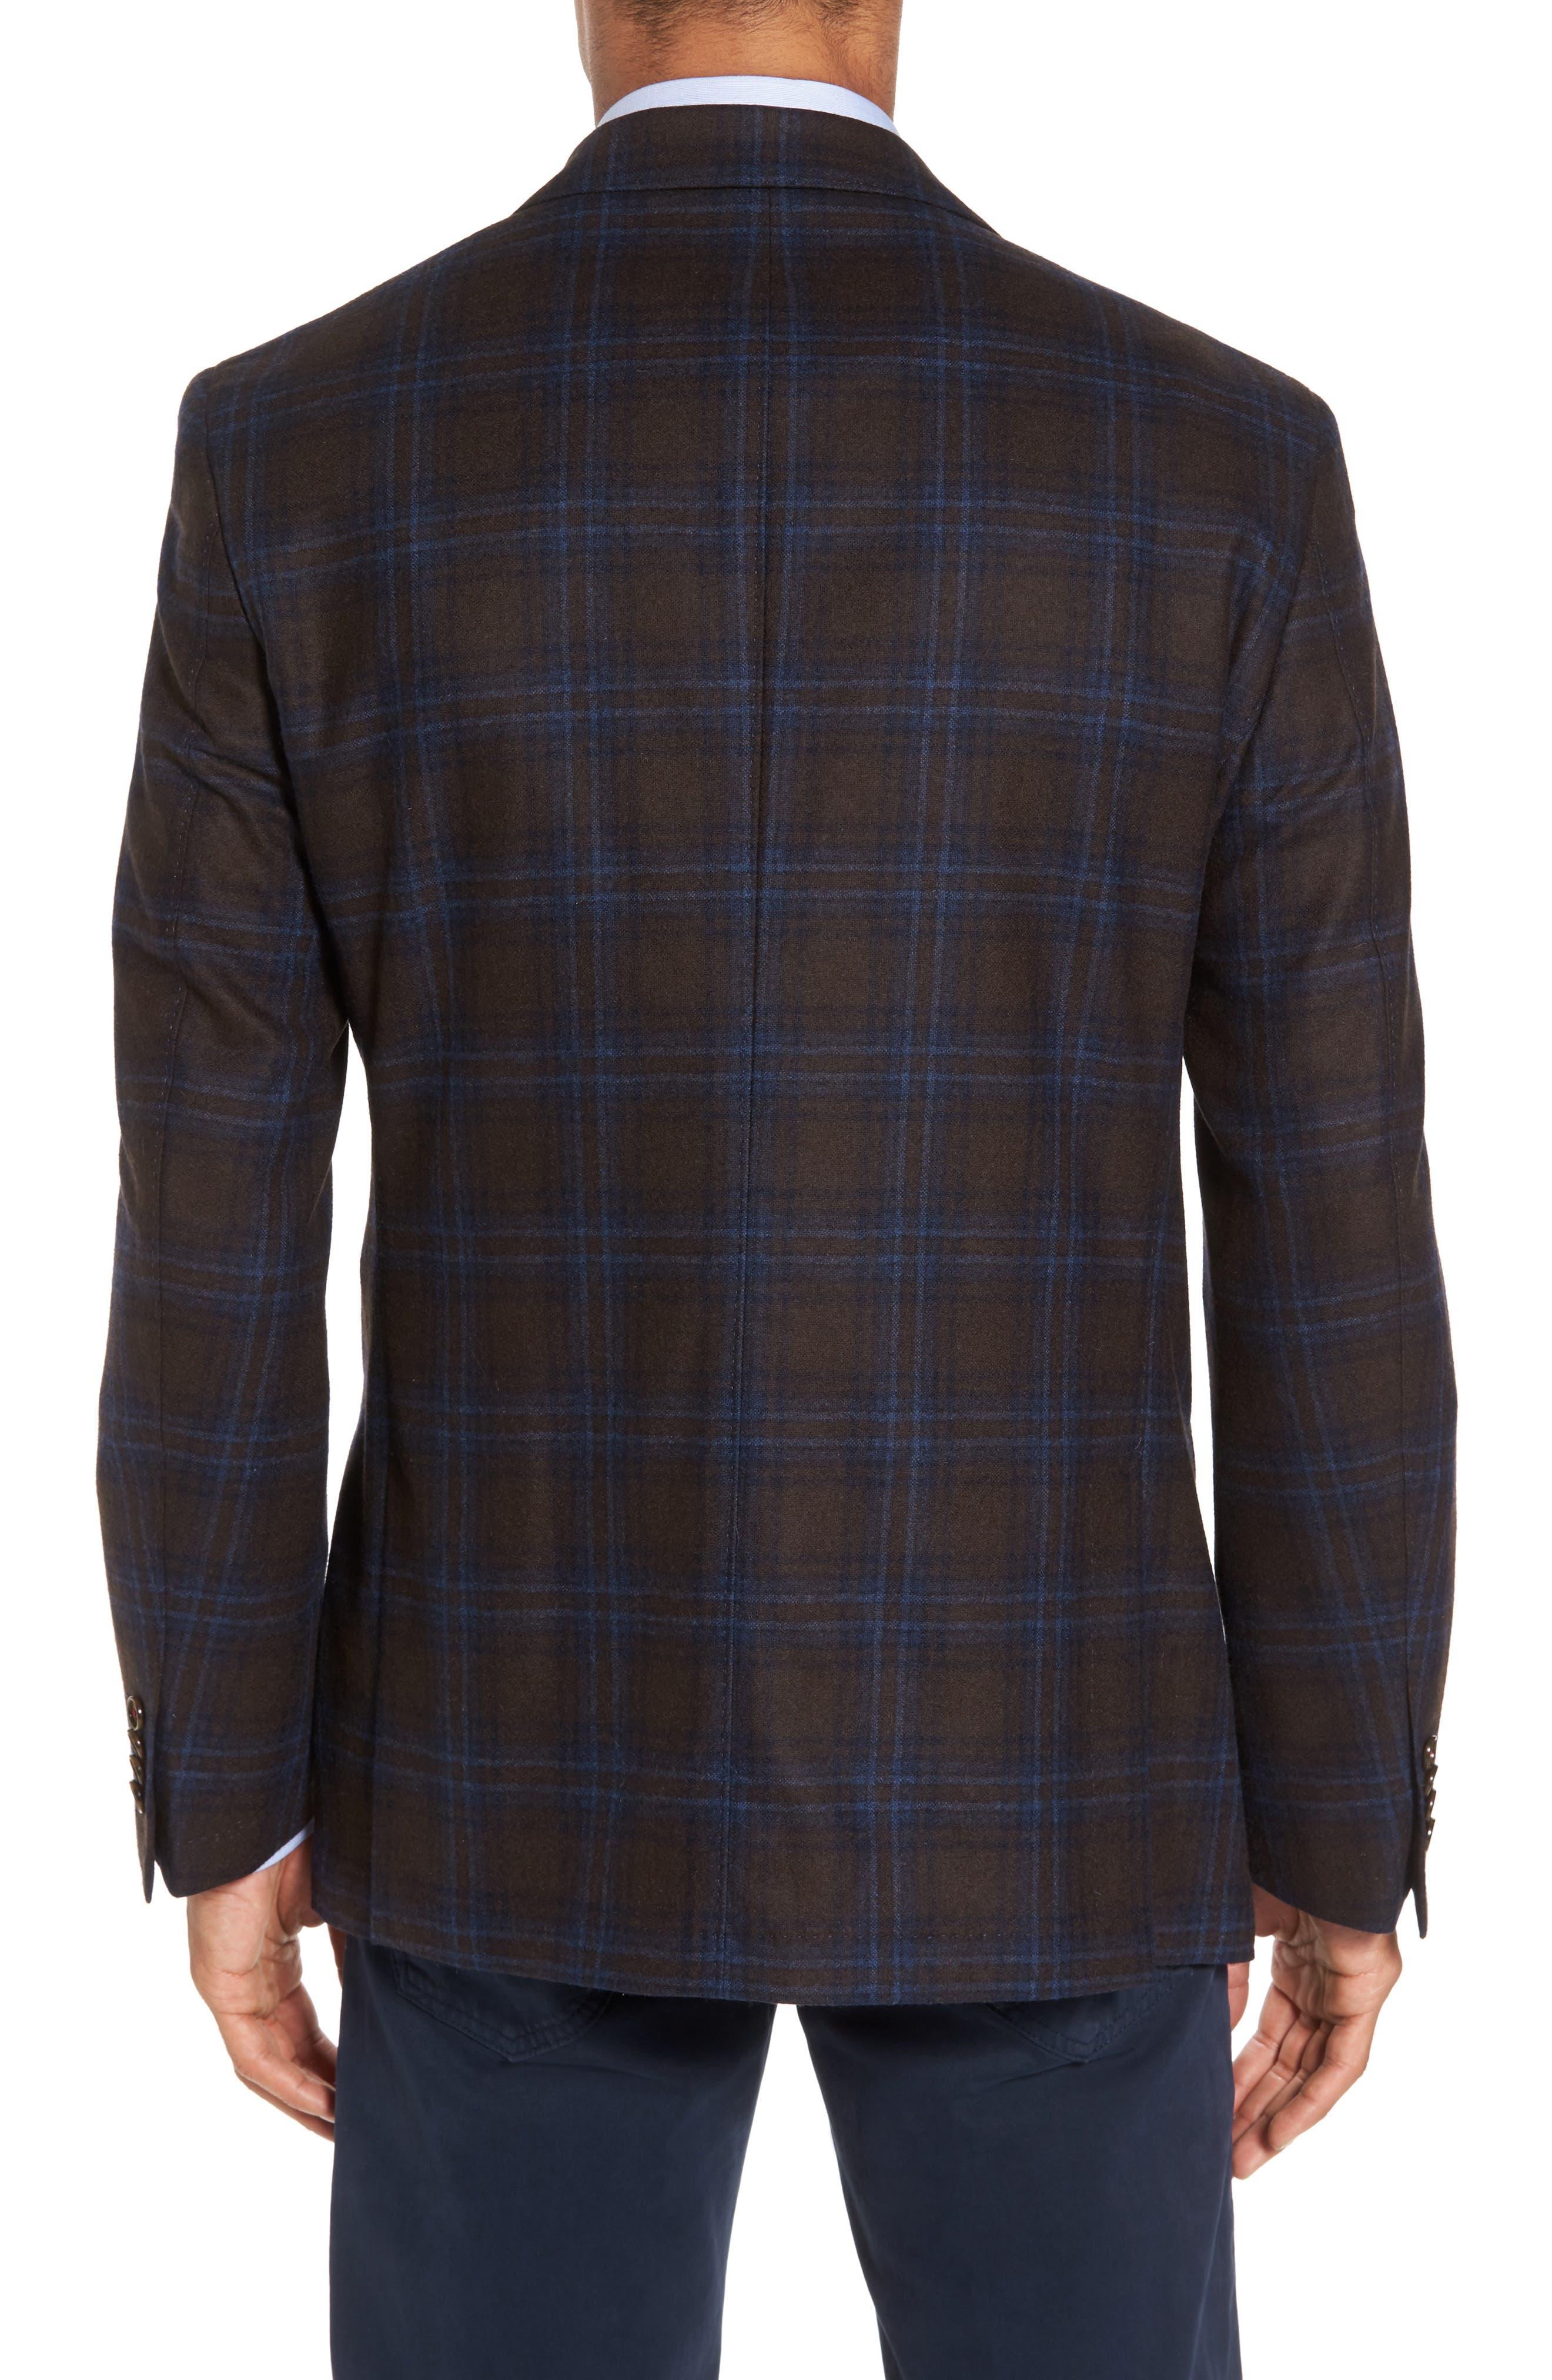 Alternate Image 2  - JKT New York Trim Fit Plaid Wool Blend Sport Coat